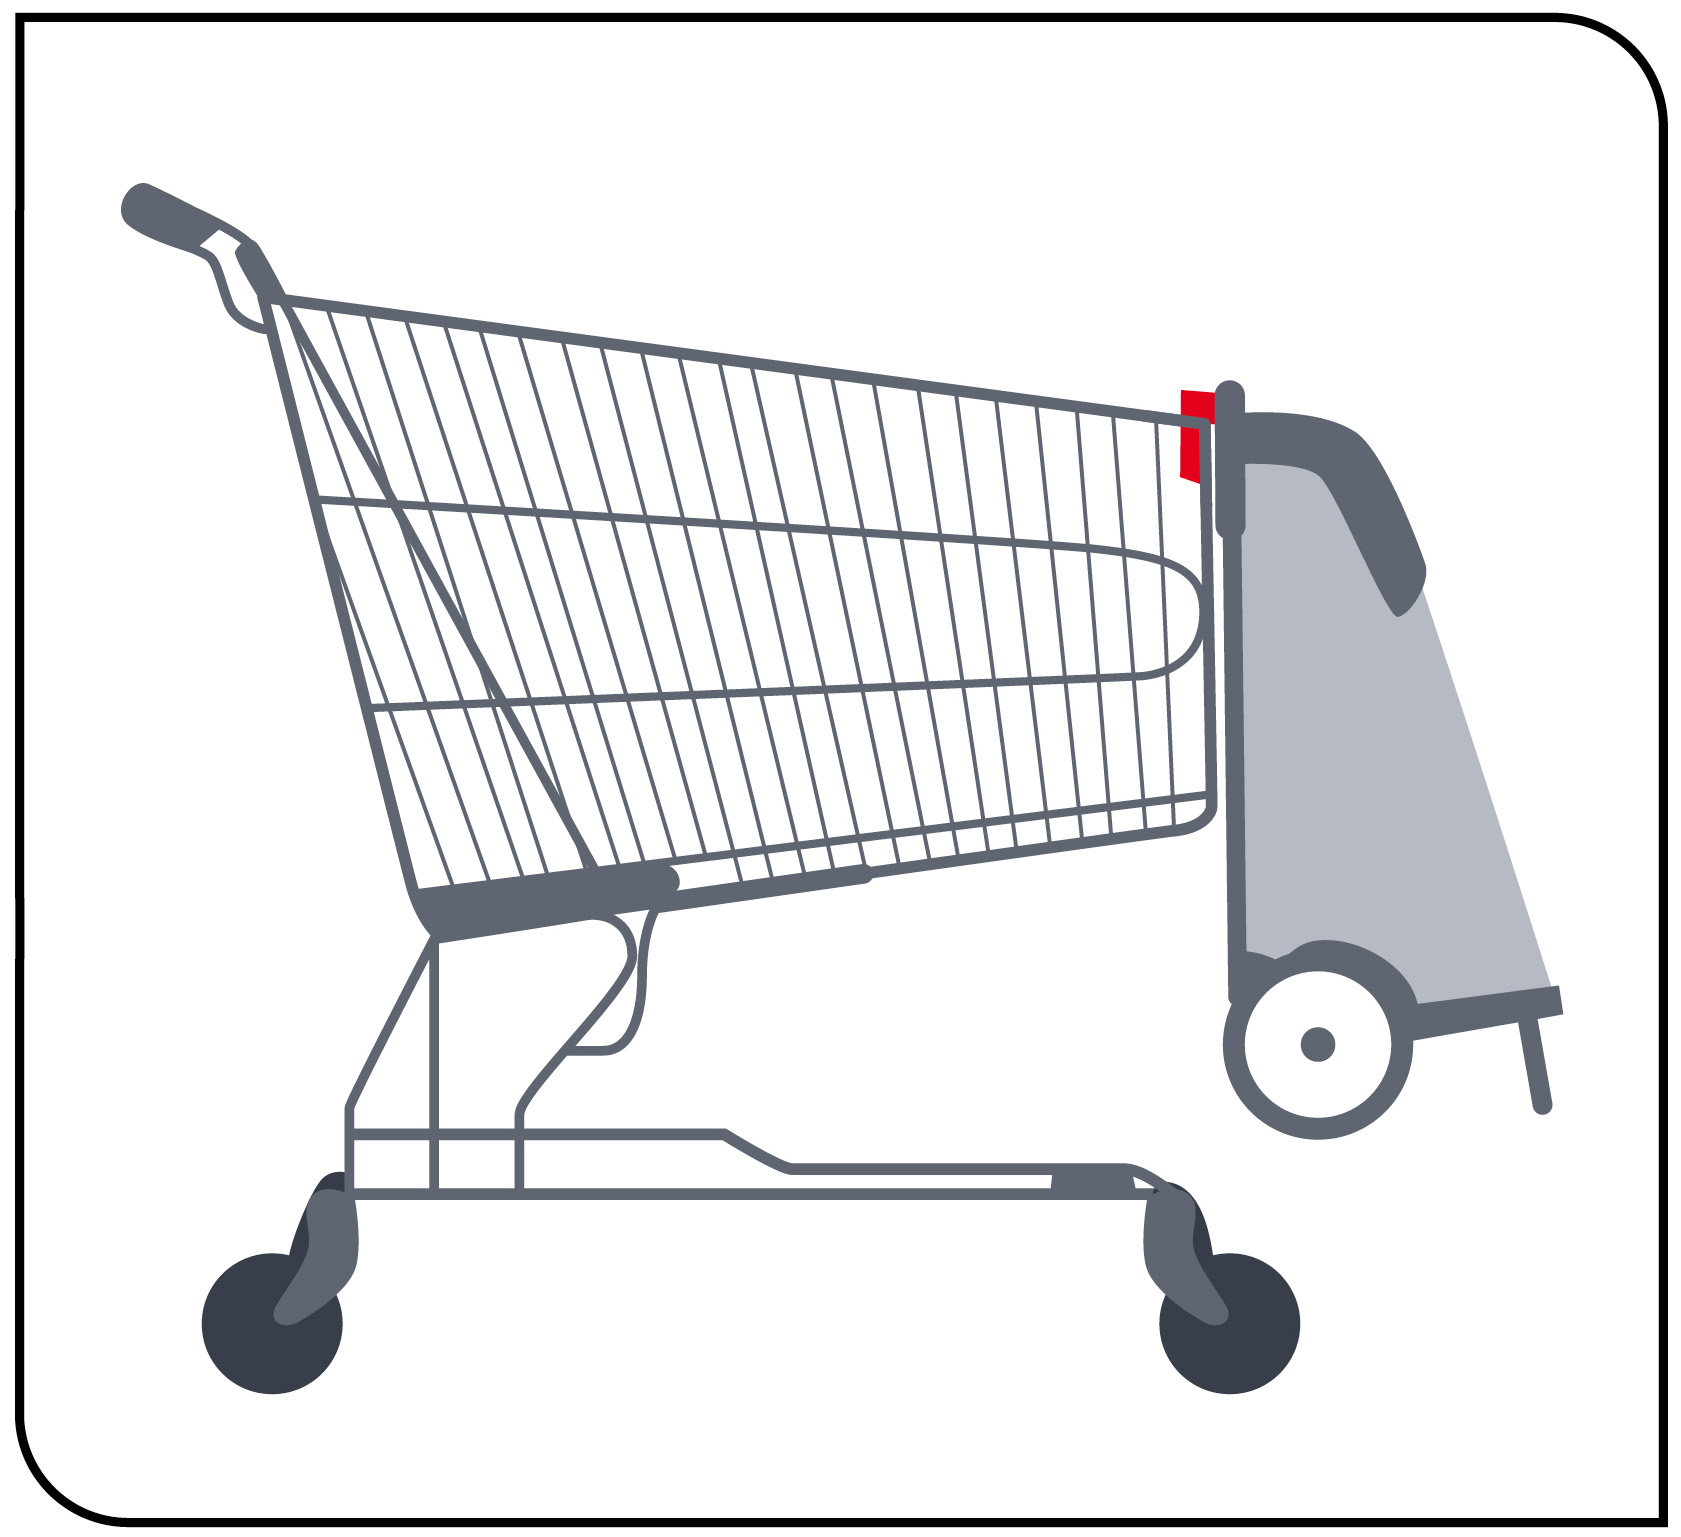 Gimi Flexi сумка-тележка 45 л. Gimi Flexi сумка-тележка хозяйственная на колёсиках купить в Минске в...